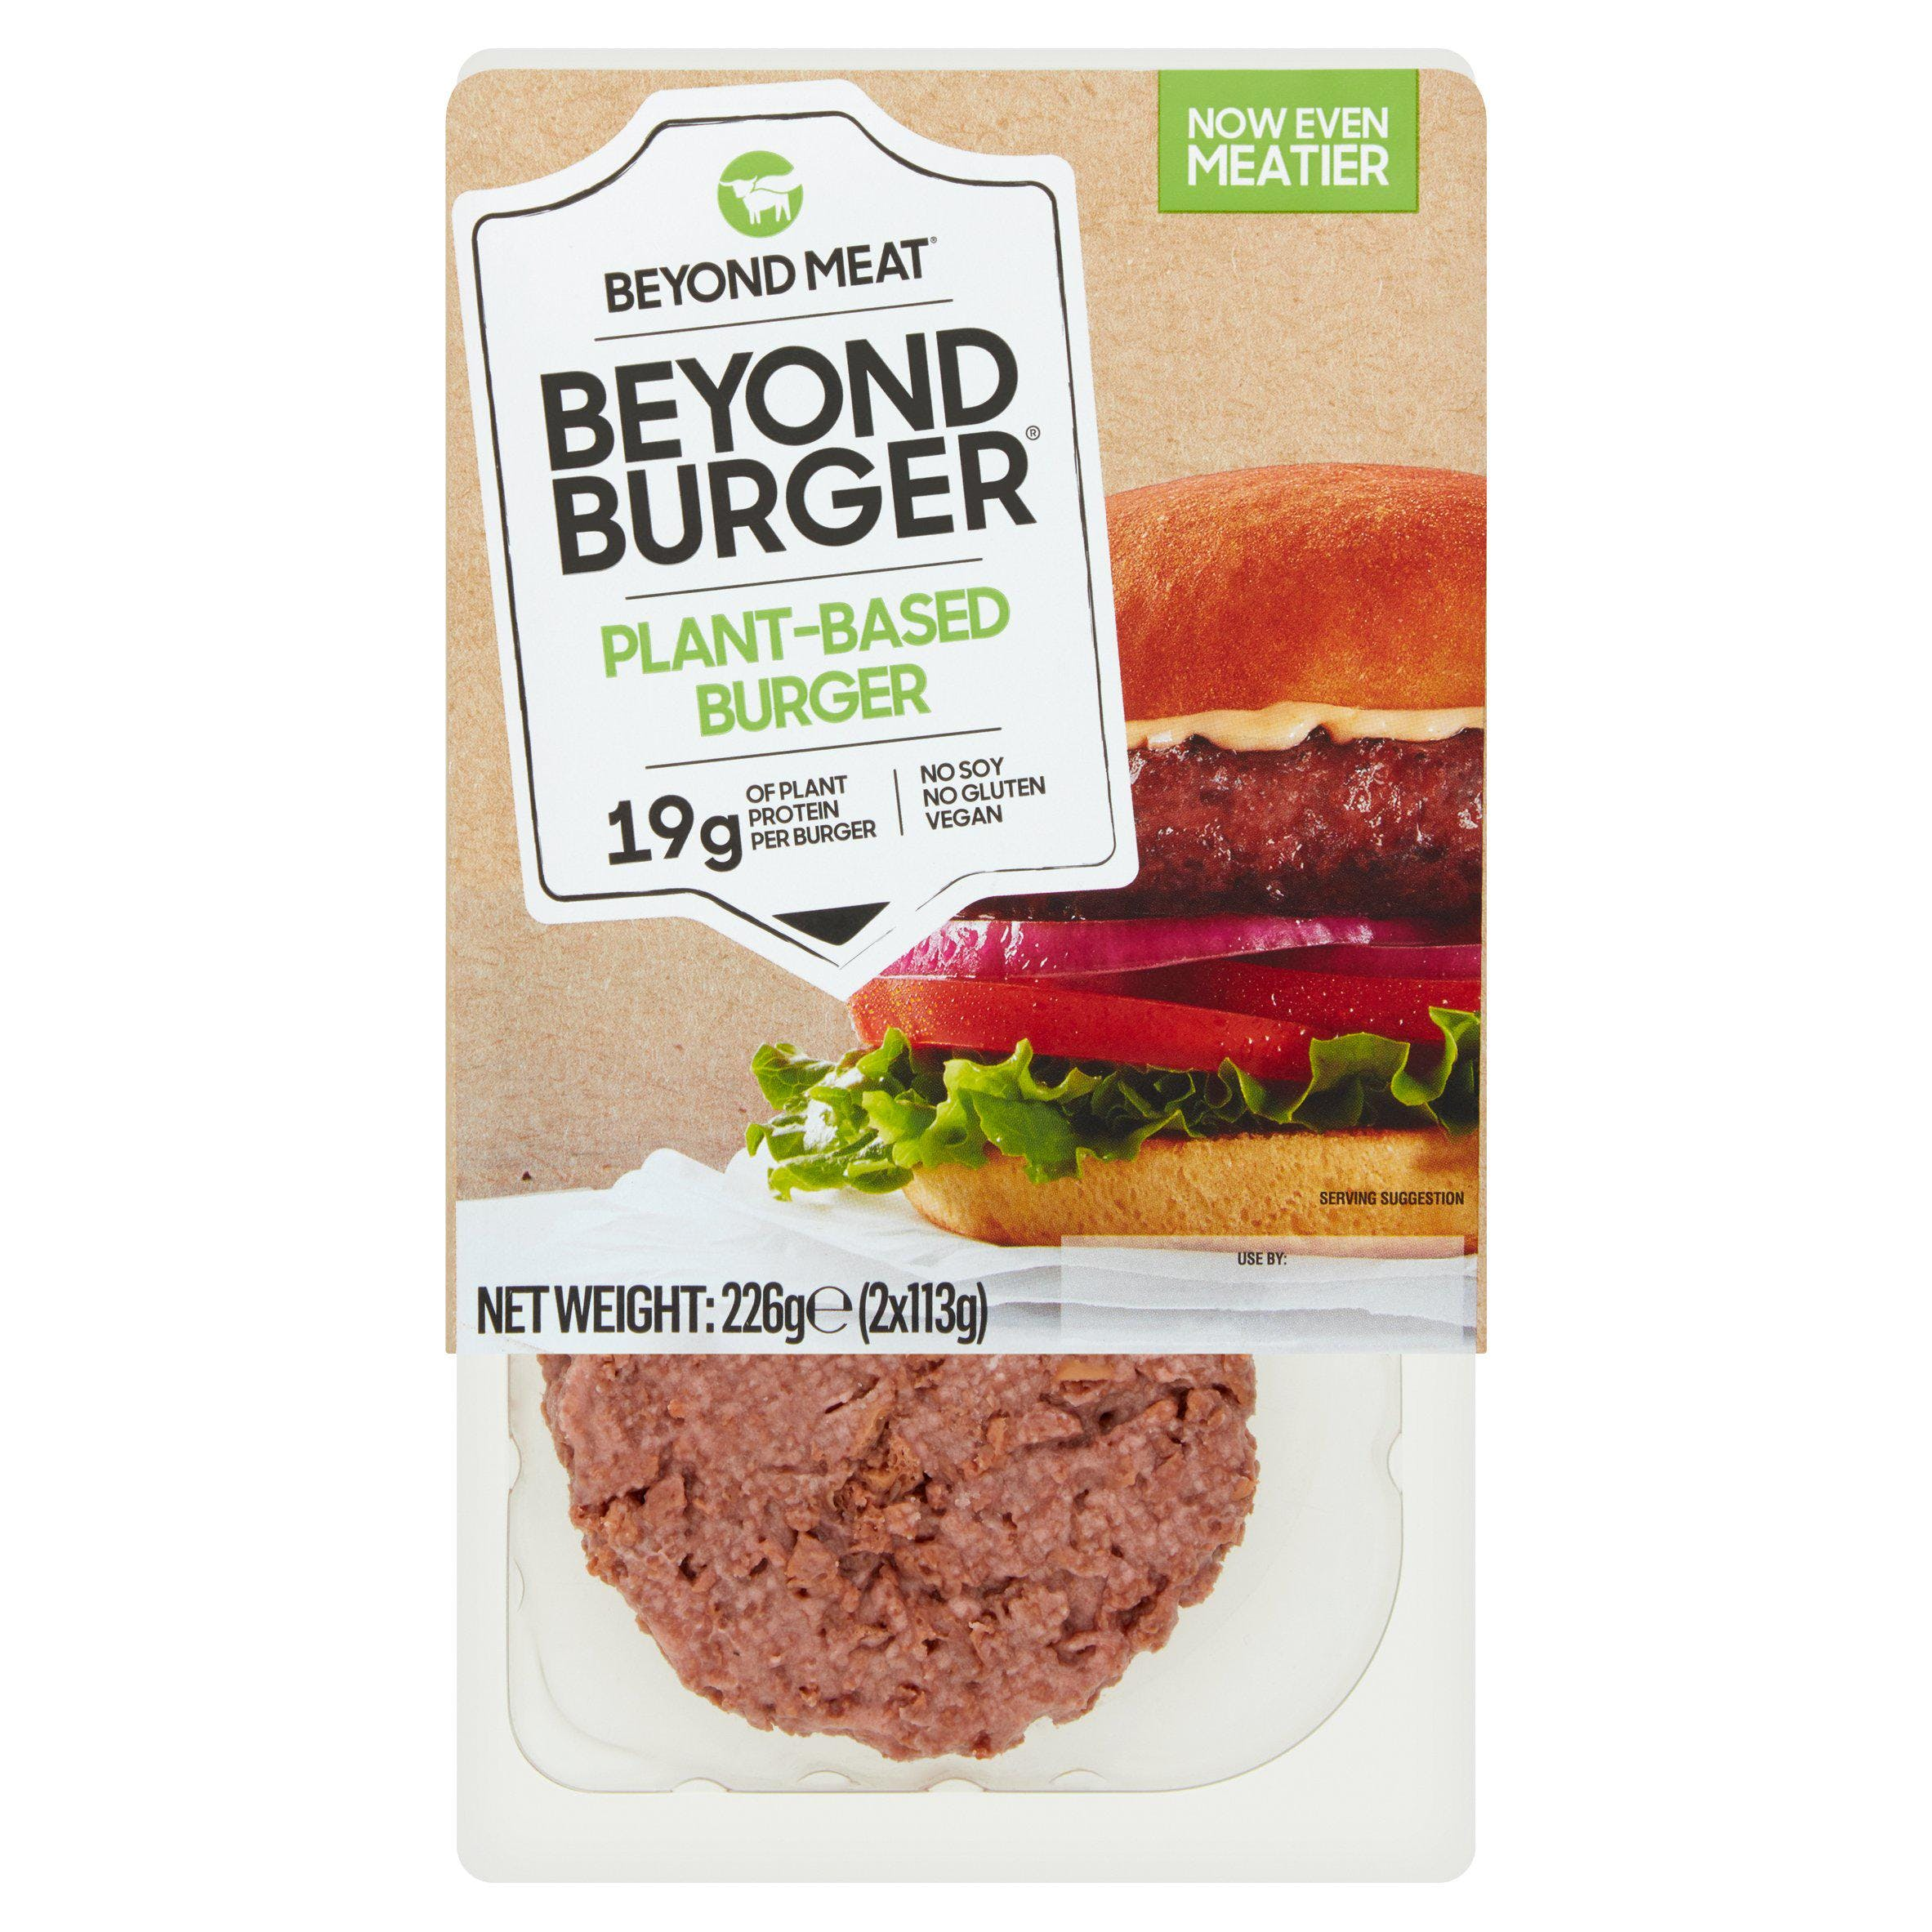 Beyond burger patties